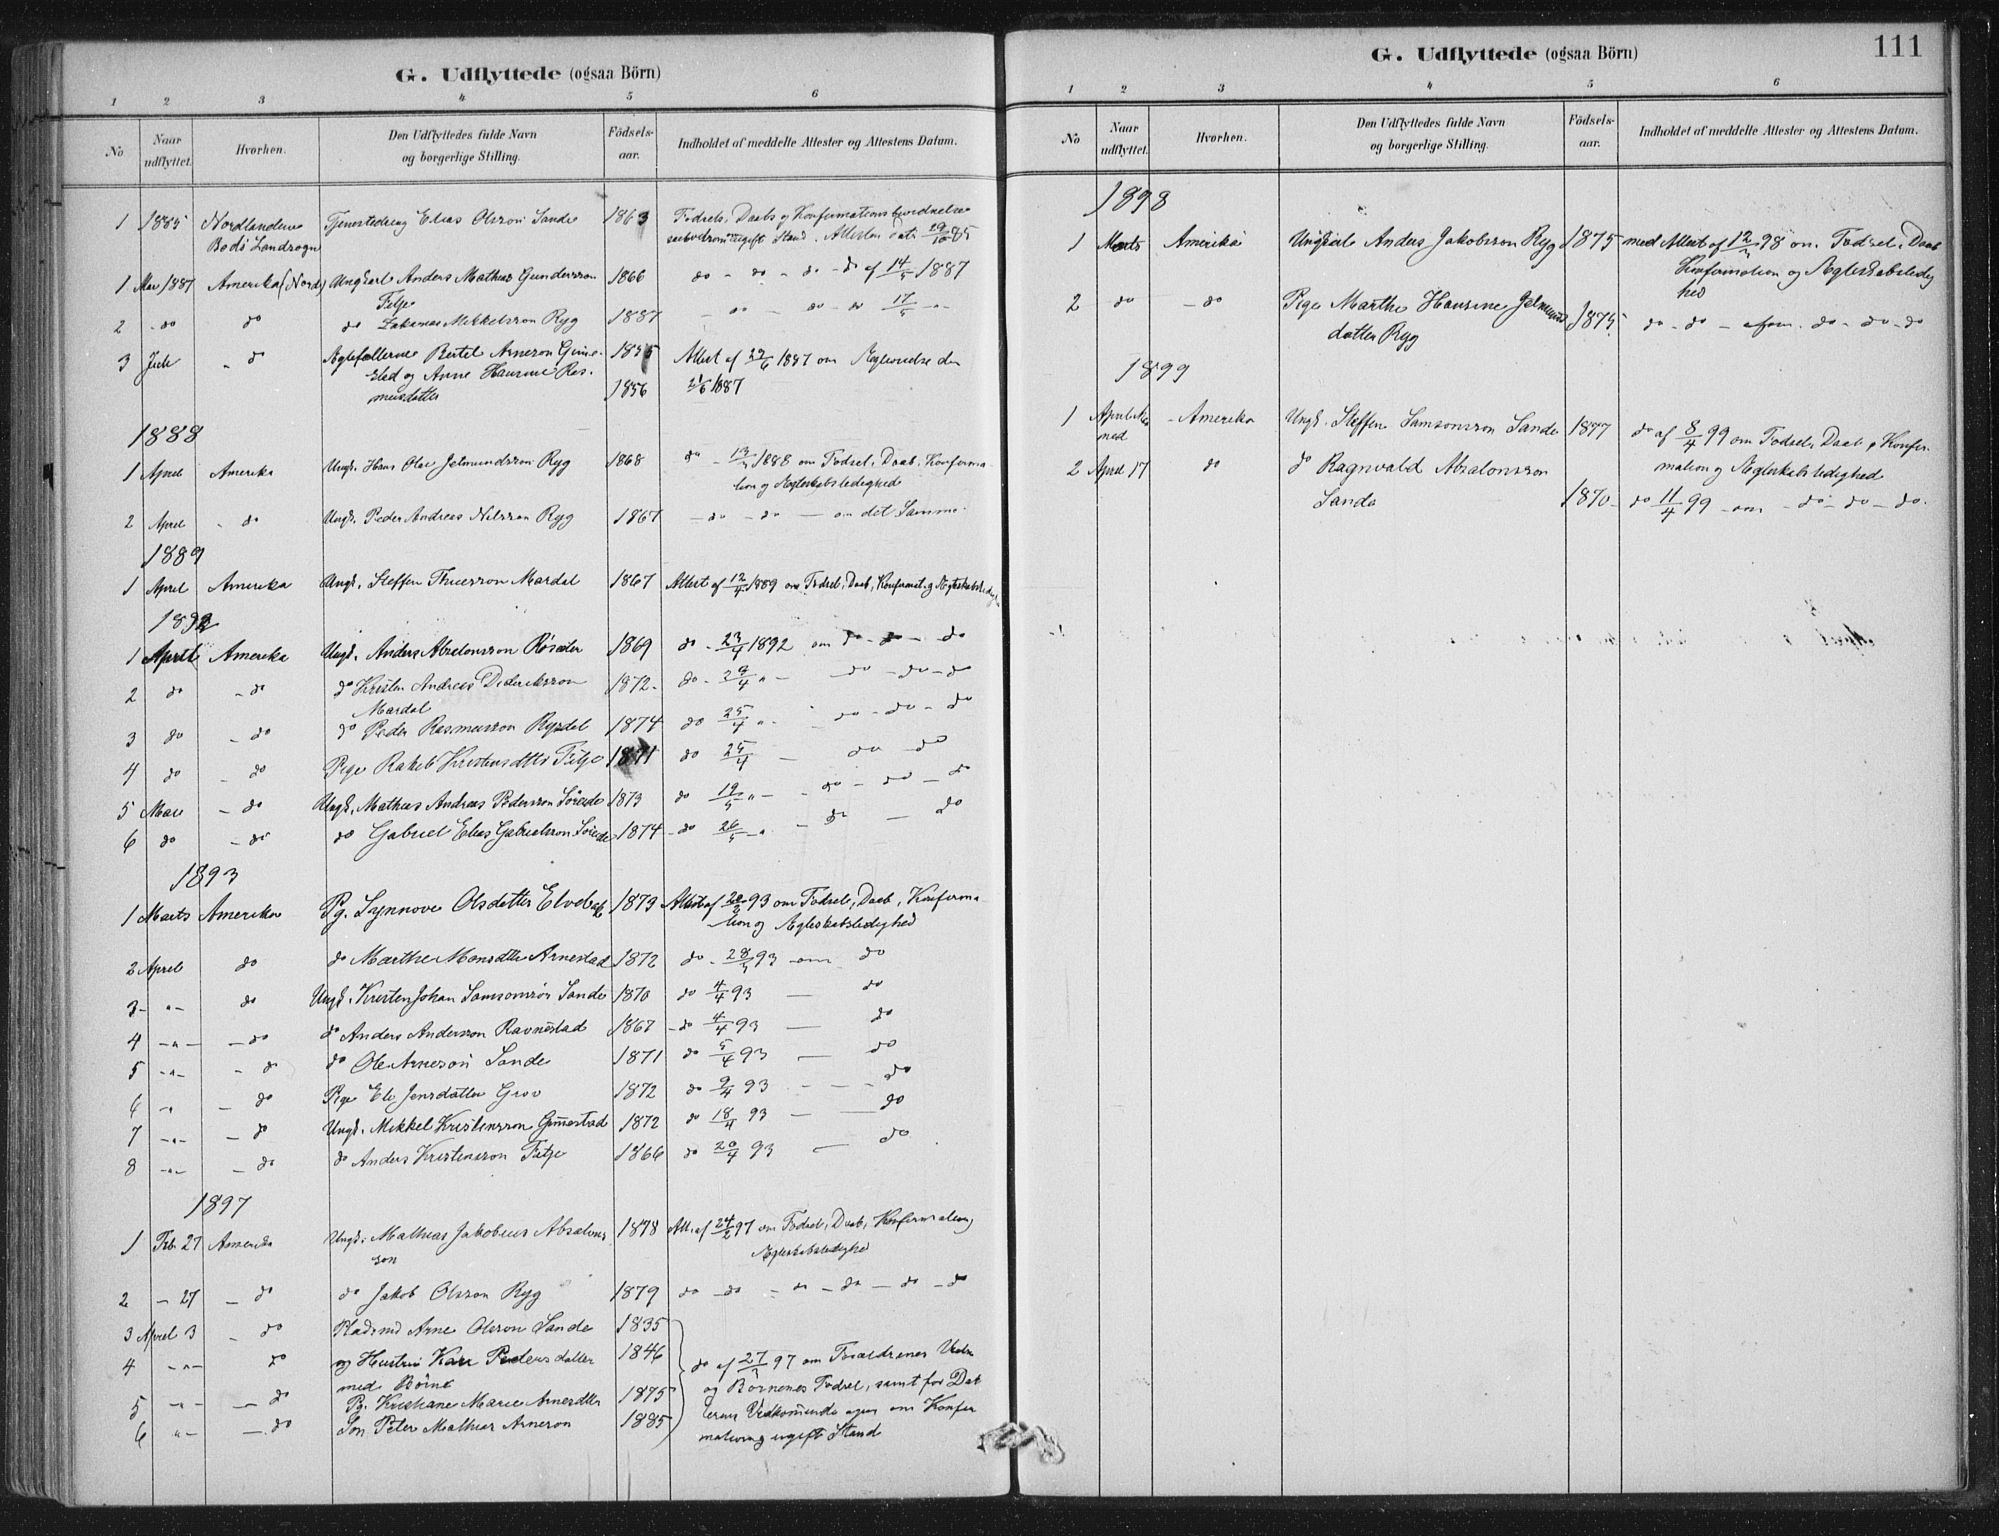 SAB, Gloppen sokneprestembete, H/Haa/Haad/L0001: Ministerialbok nr. D  1, 1885-1910, s. 111